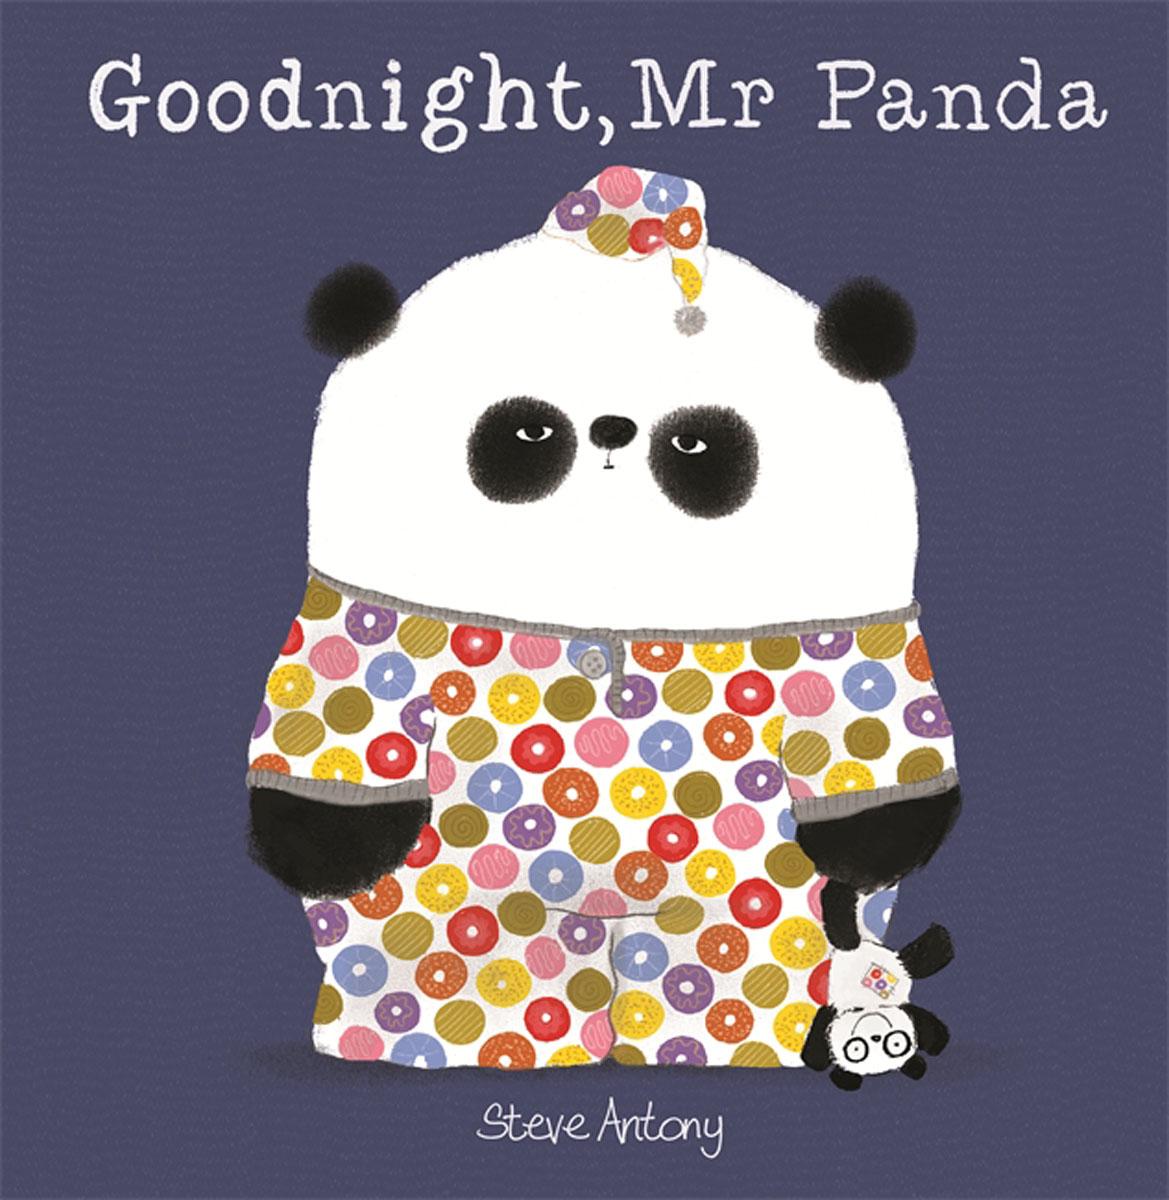 Goodnight Mr Panda goodnight peppa